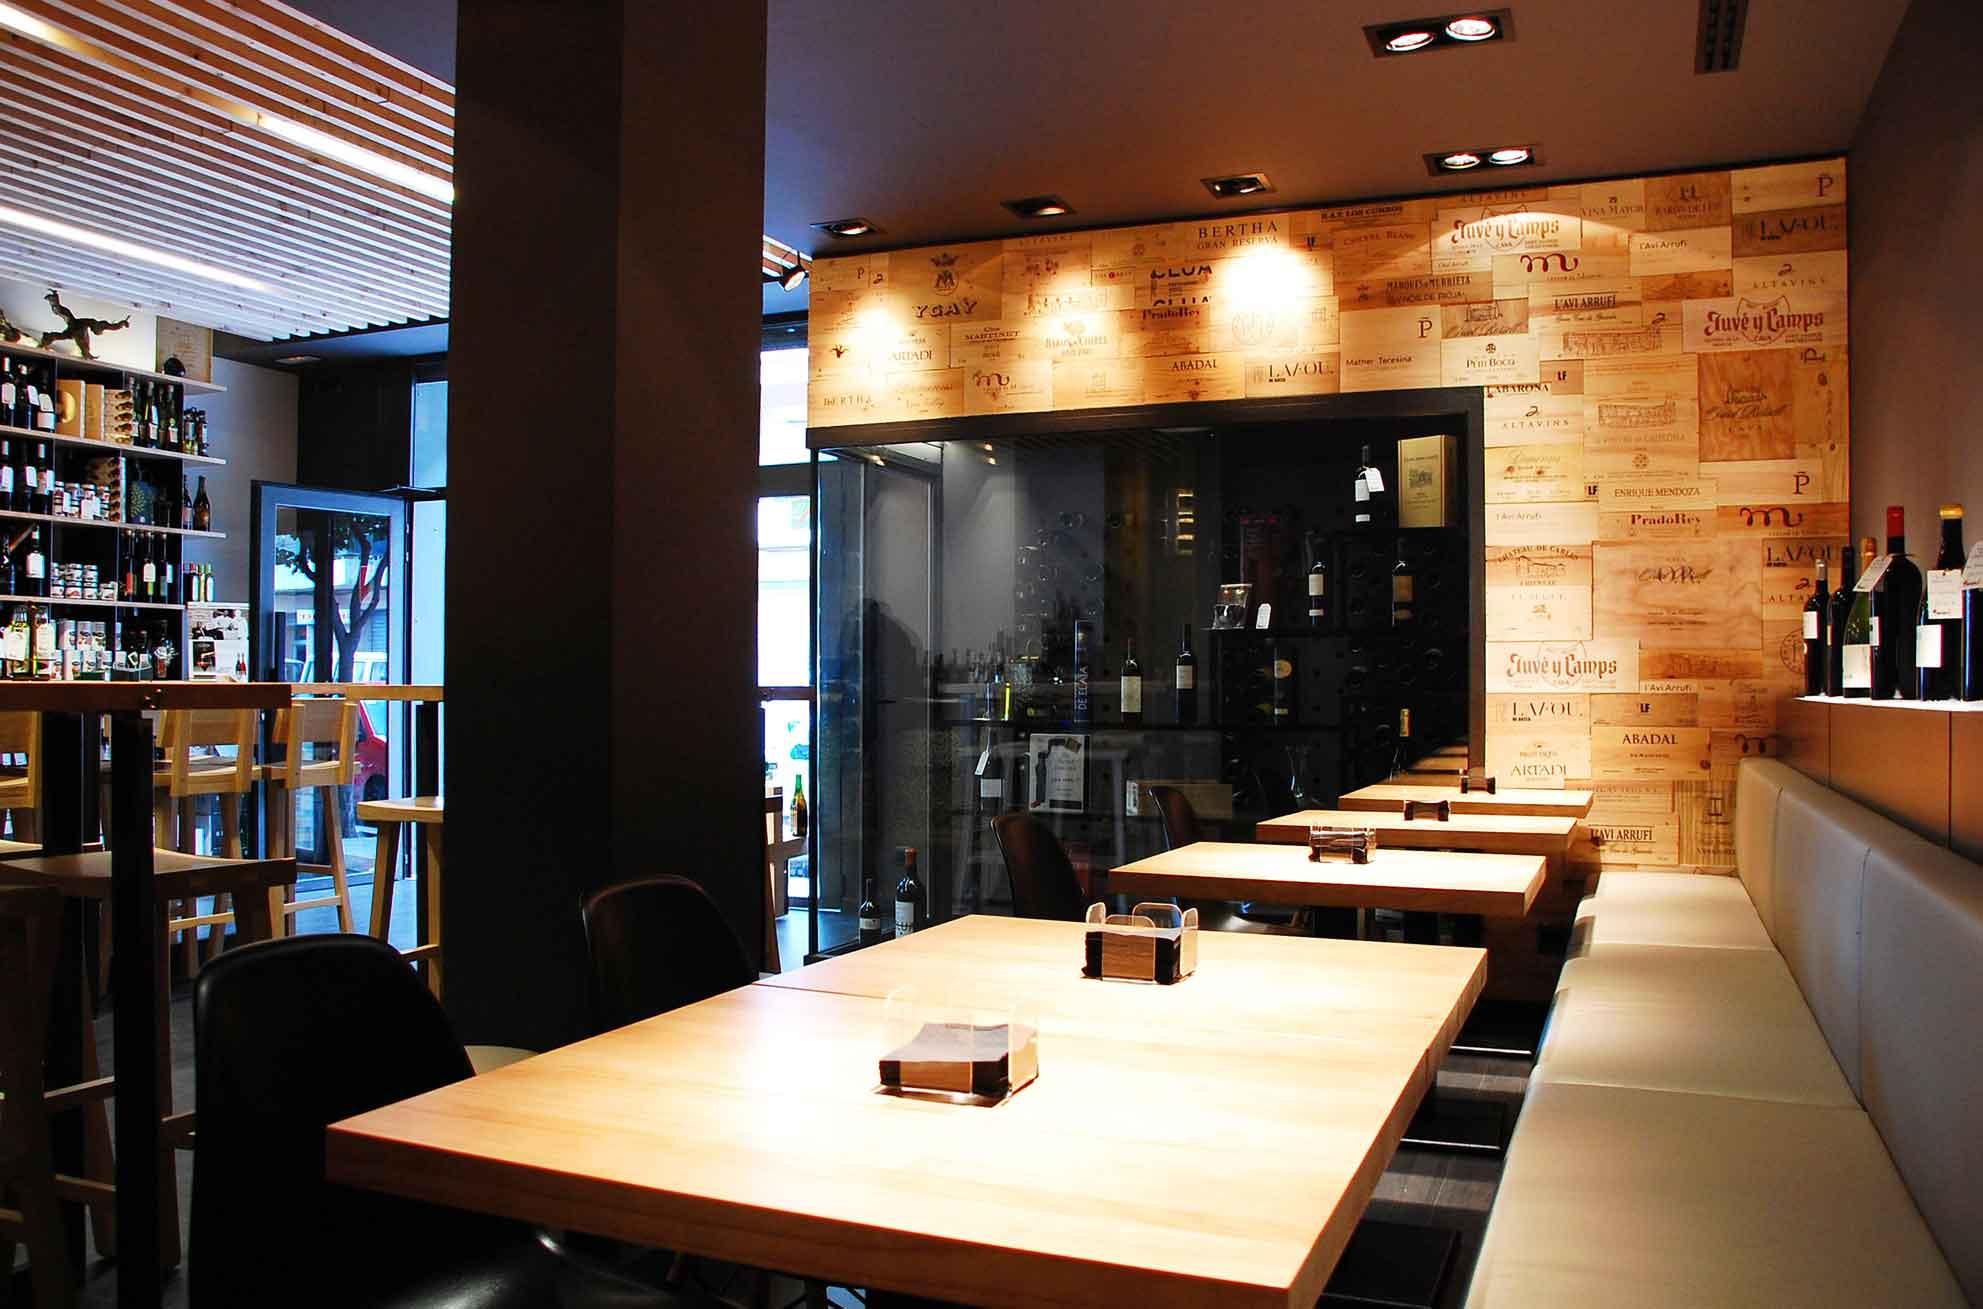 Dise o de espacios nicos en tiendas de vinos barrica - Vinotecas de madera ...